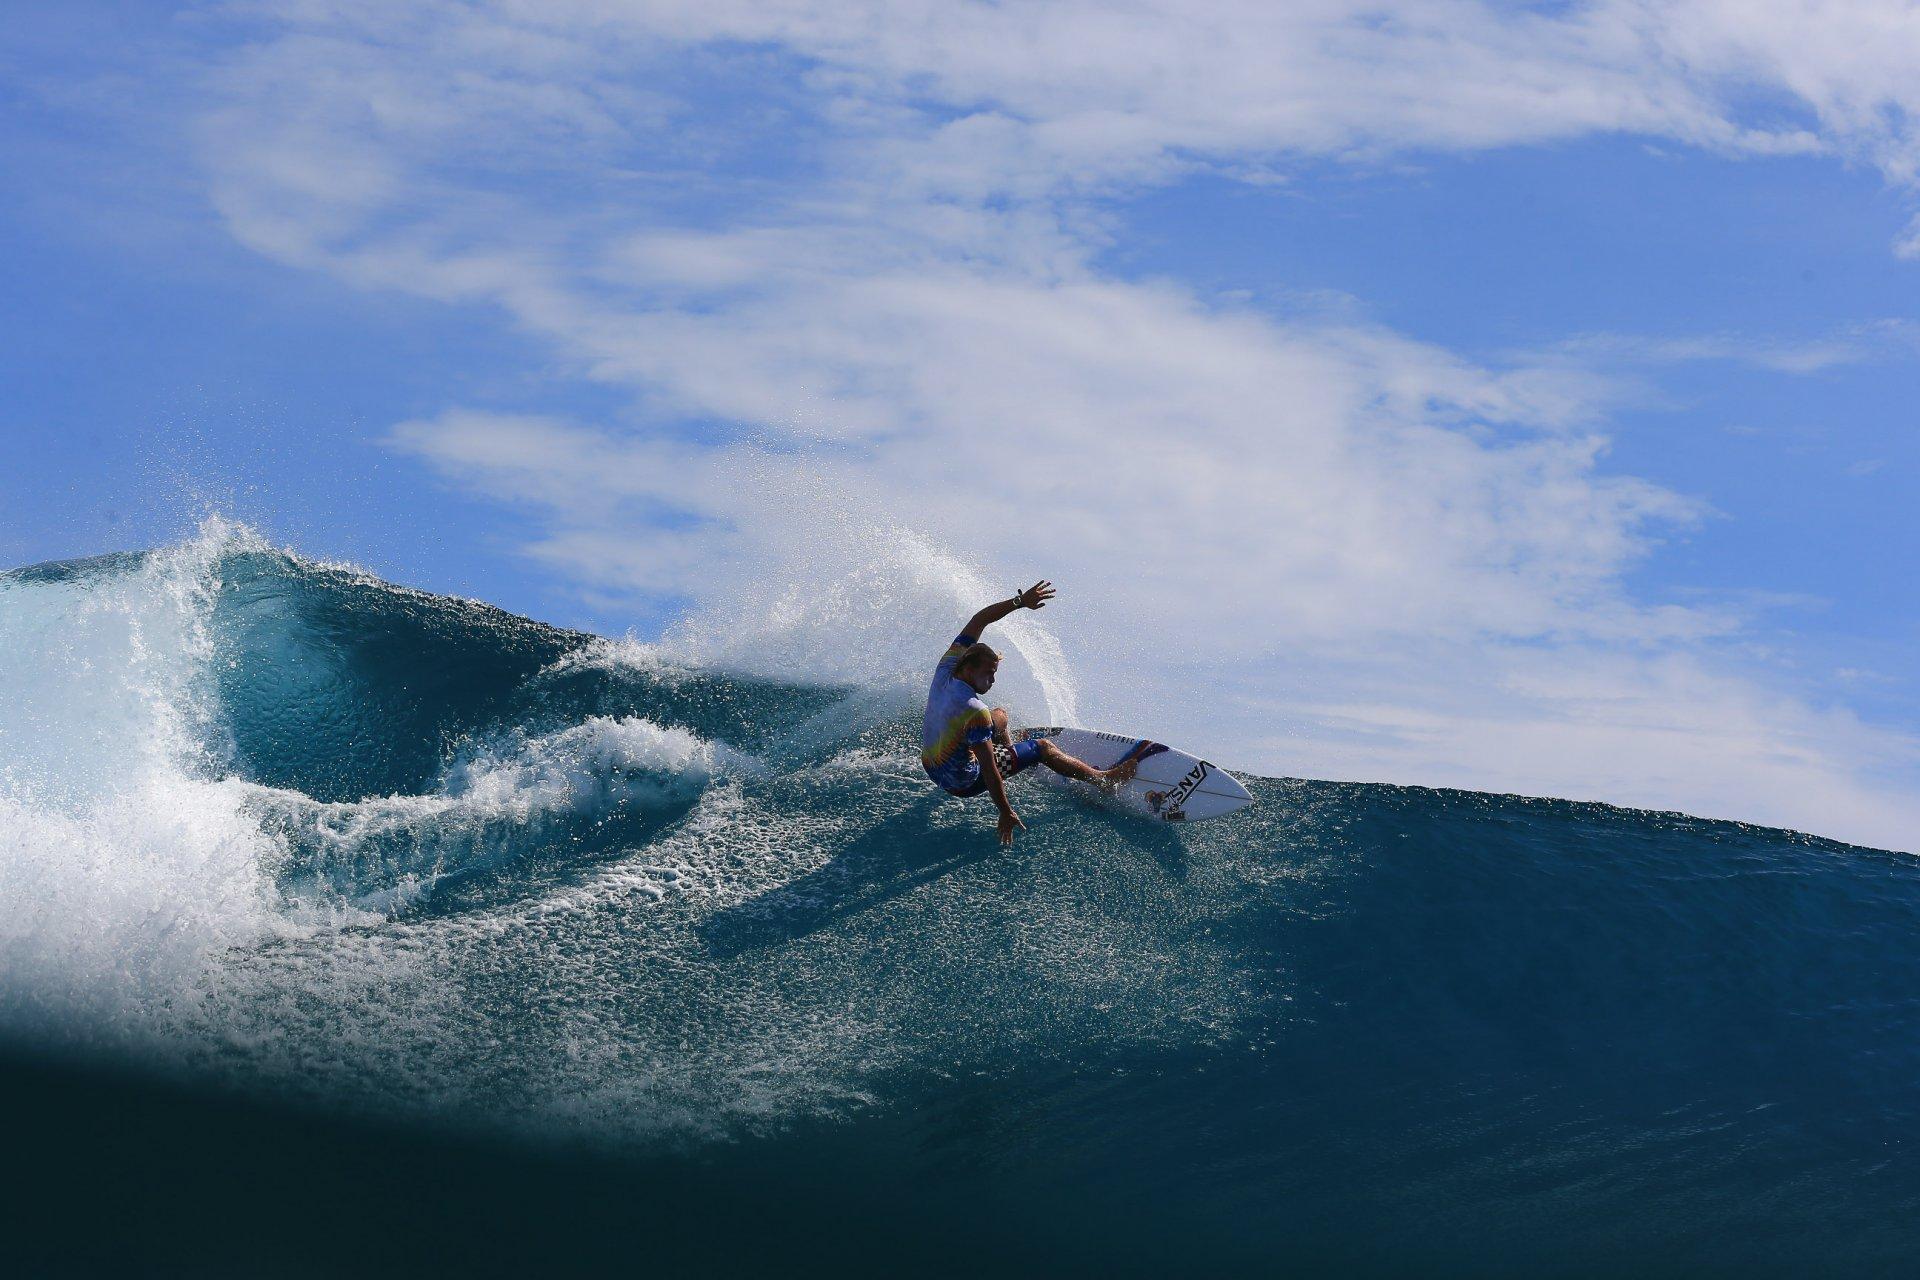 Tanner Gudauskas, resort latitude zero, surfing, mangalui, Telo Islands, Vans, Indonesia